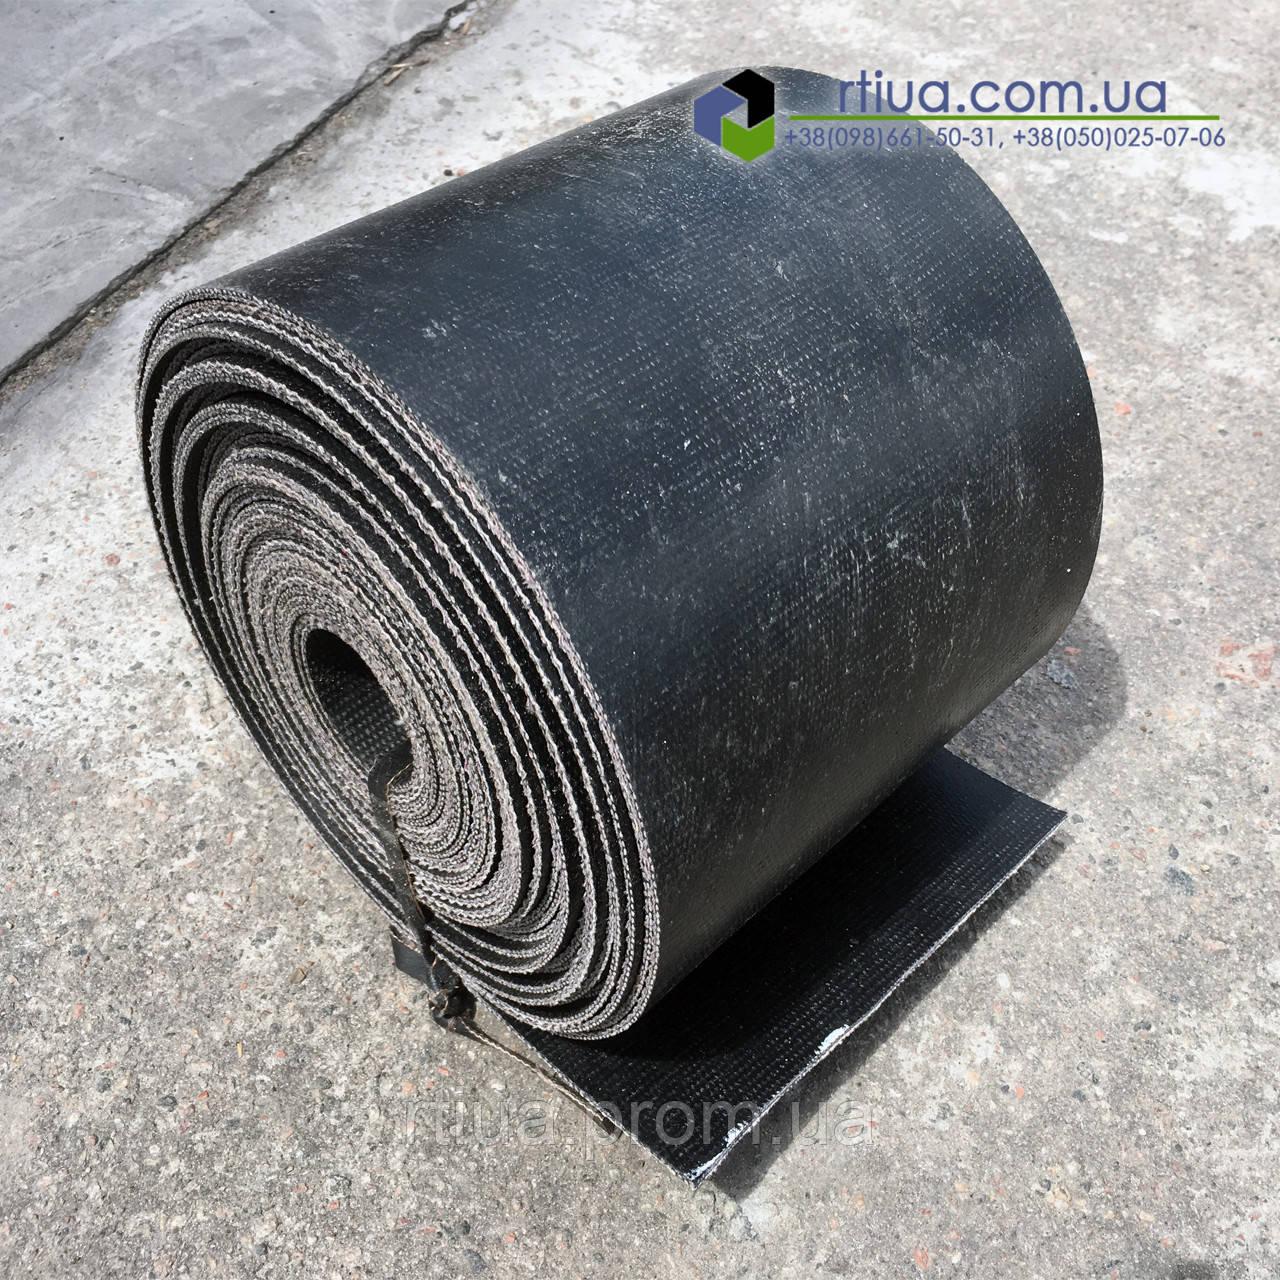 Транспортерная лента ТК-200, 800х4 - 4/2 (10 мм)